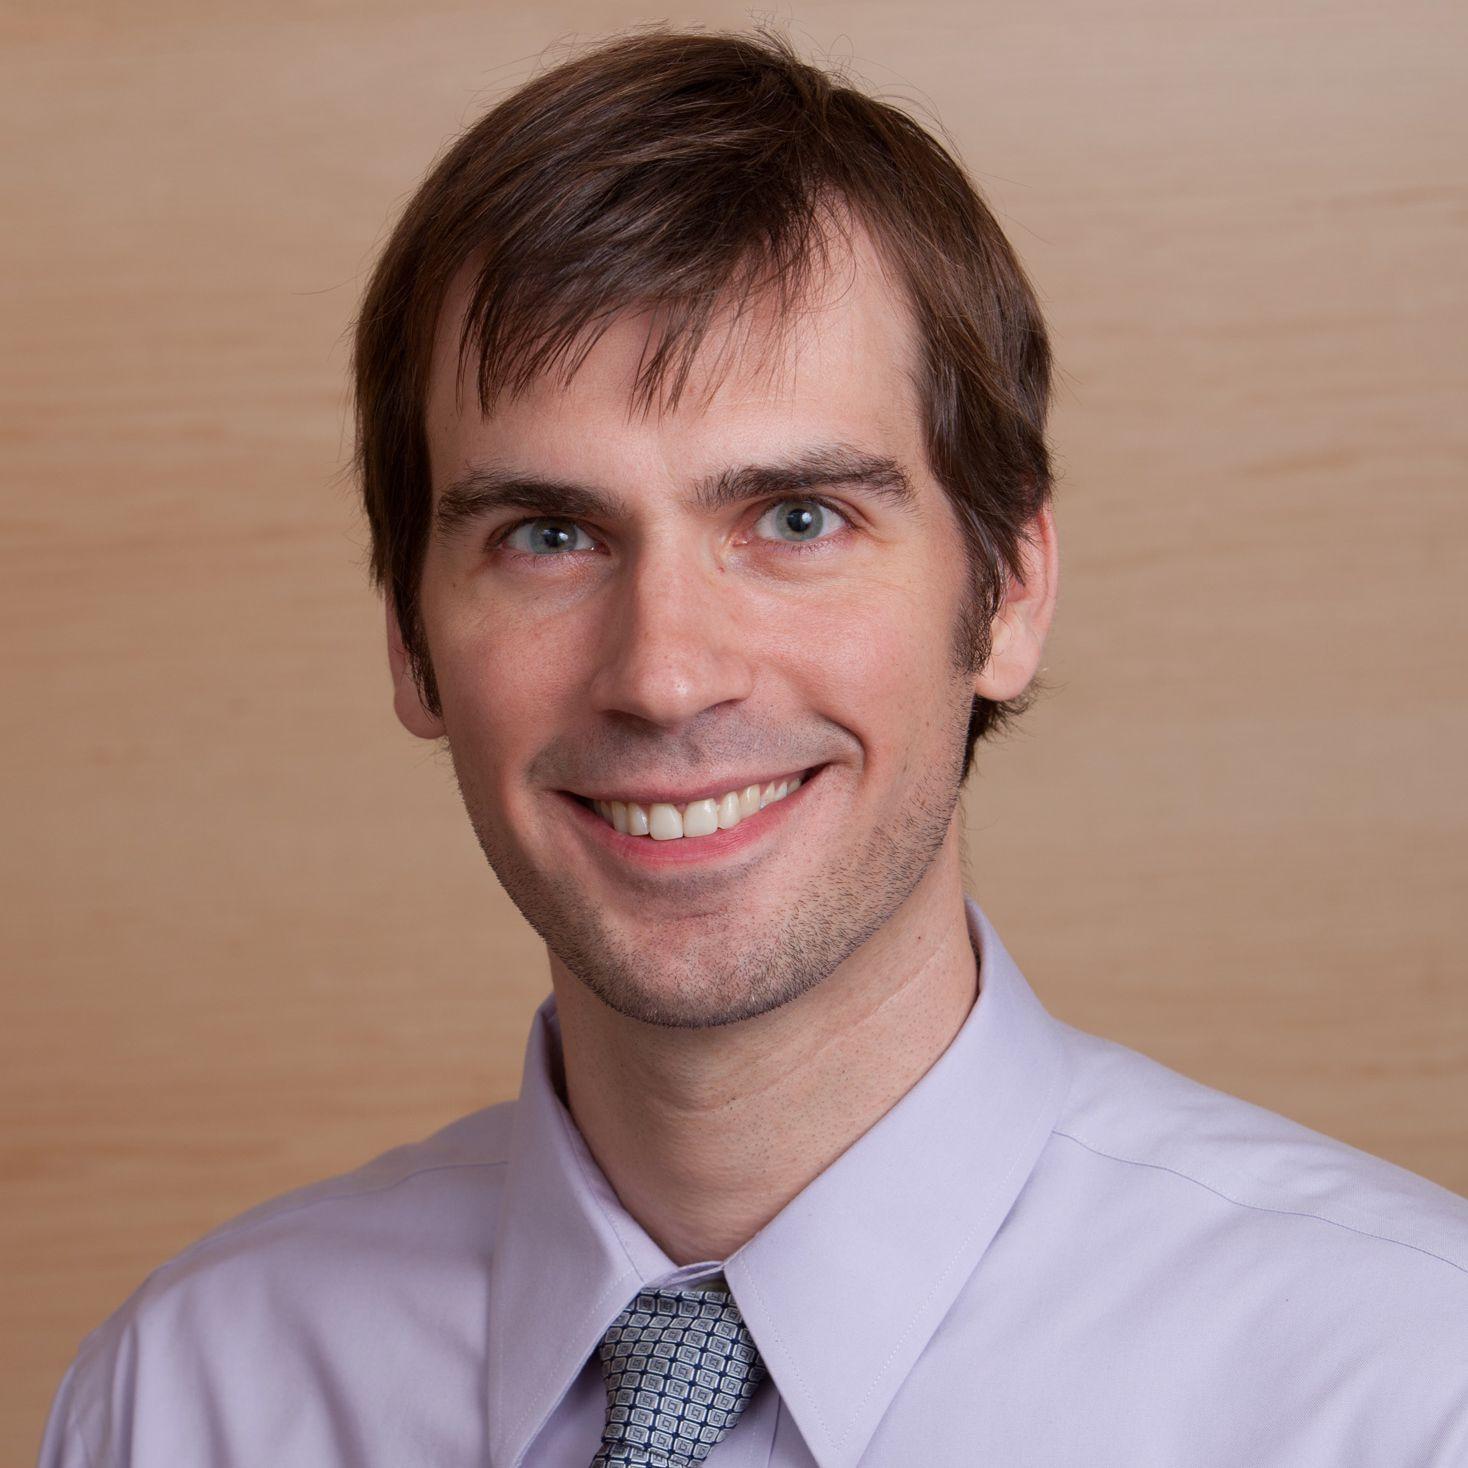 Bart DeJonghe of the University of Pennsylvania School of Nursing